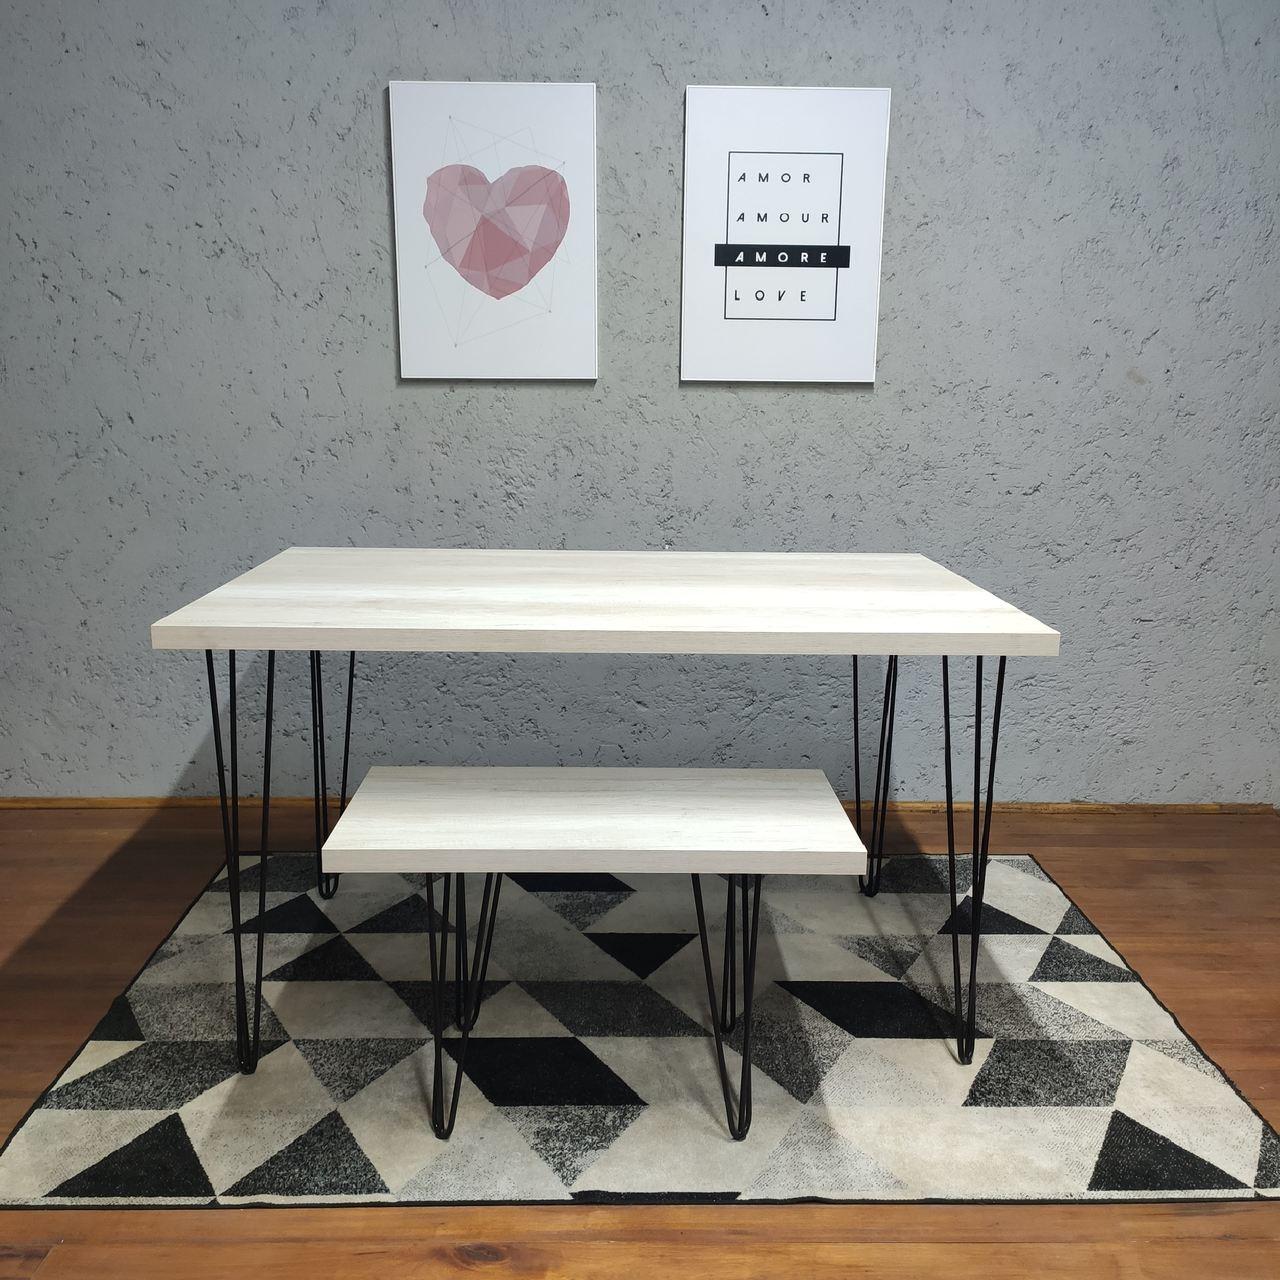 Mesas de Jantar e Banco sob medida com Hairpin Legs e Tampo 100% MDF  - Mtne Store